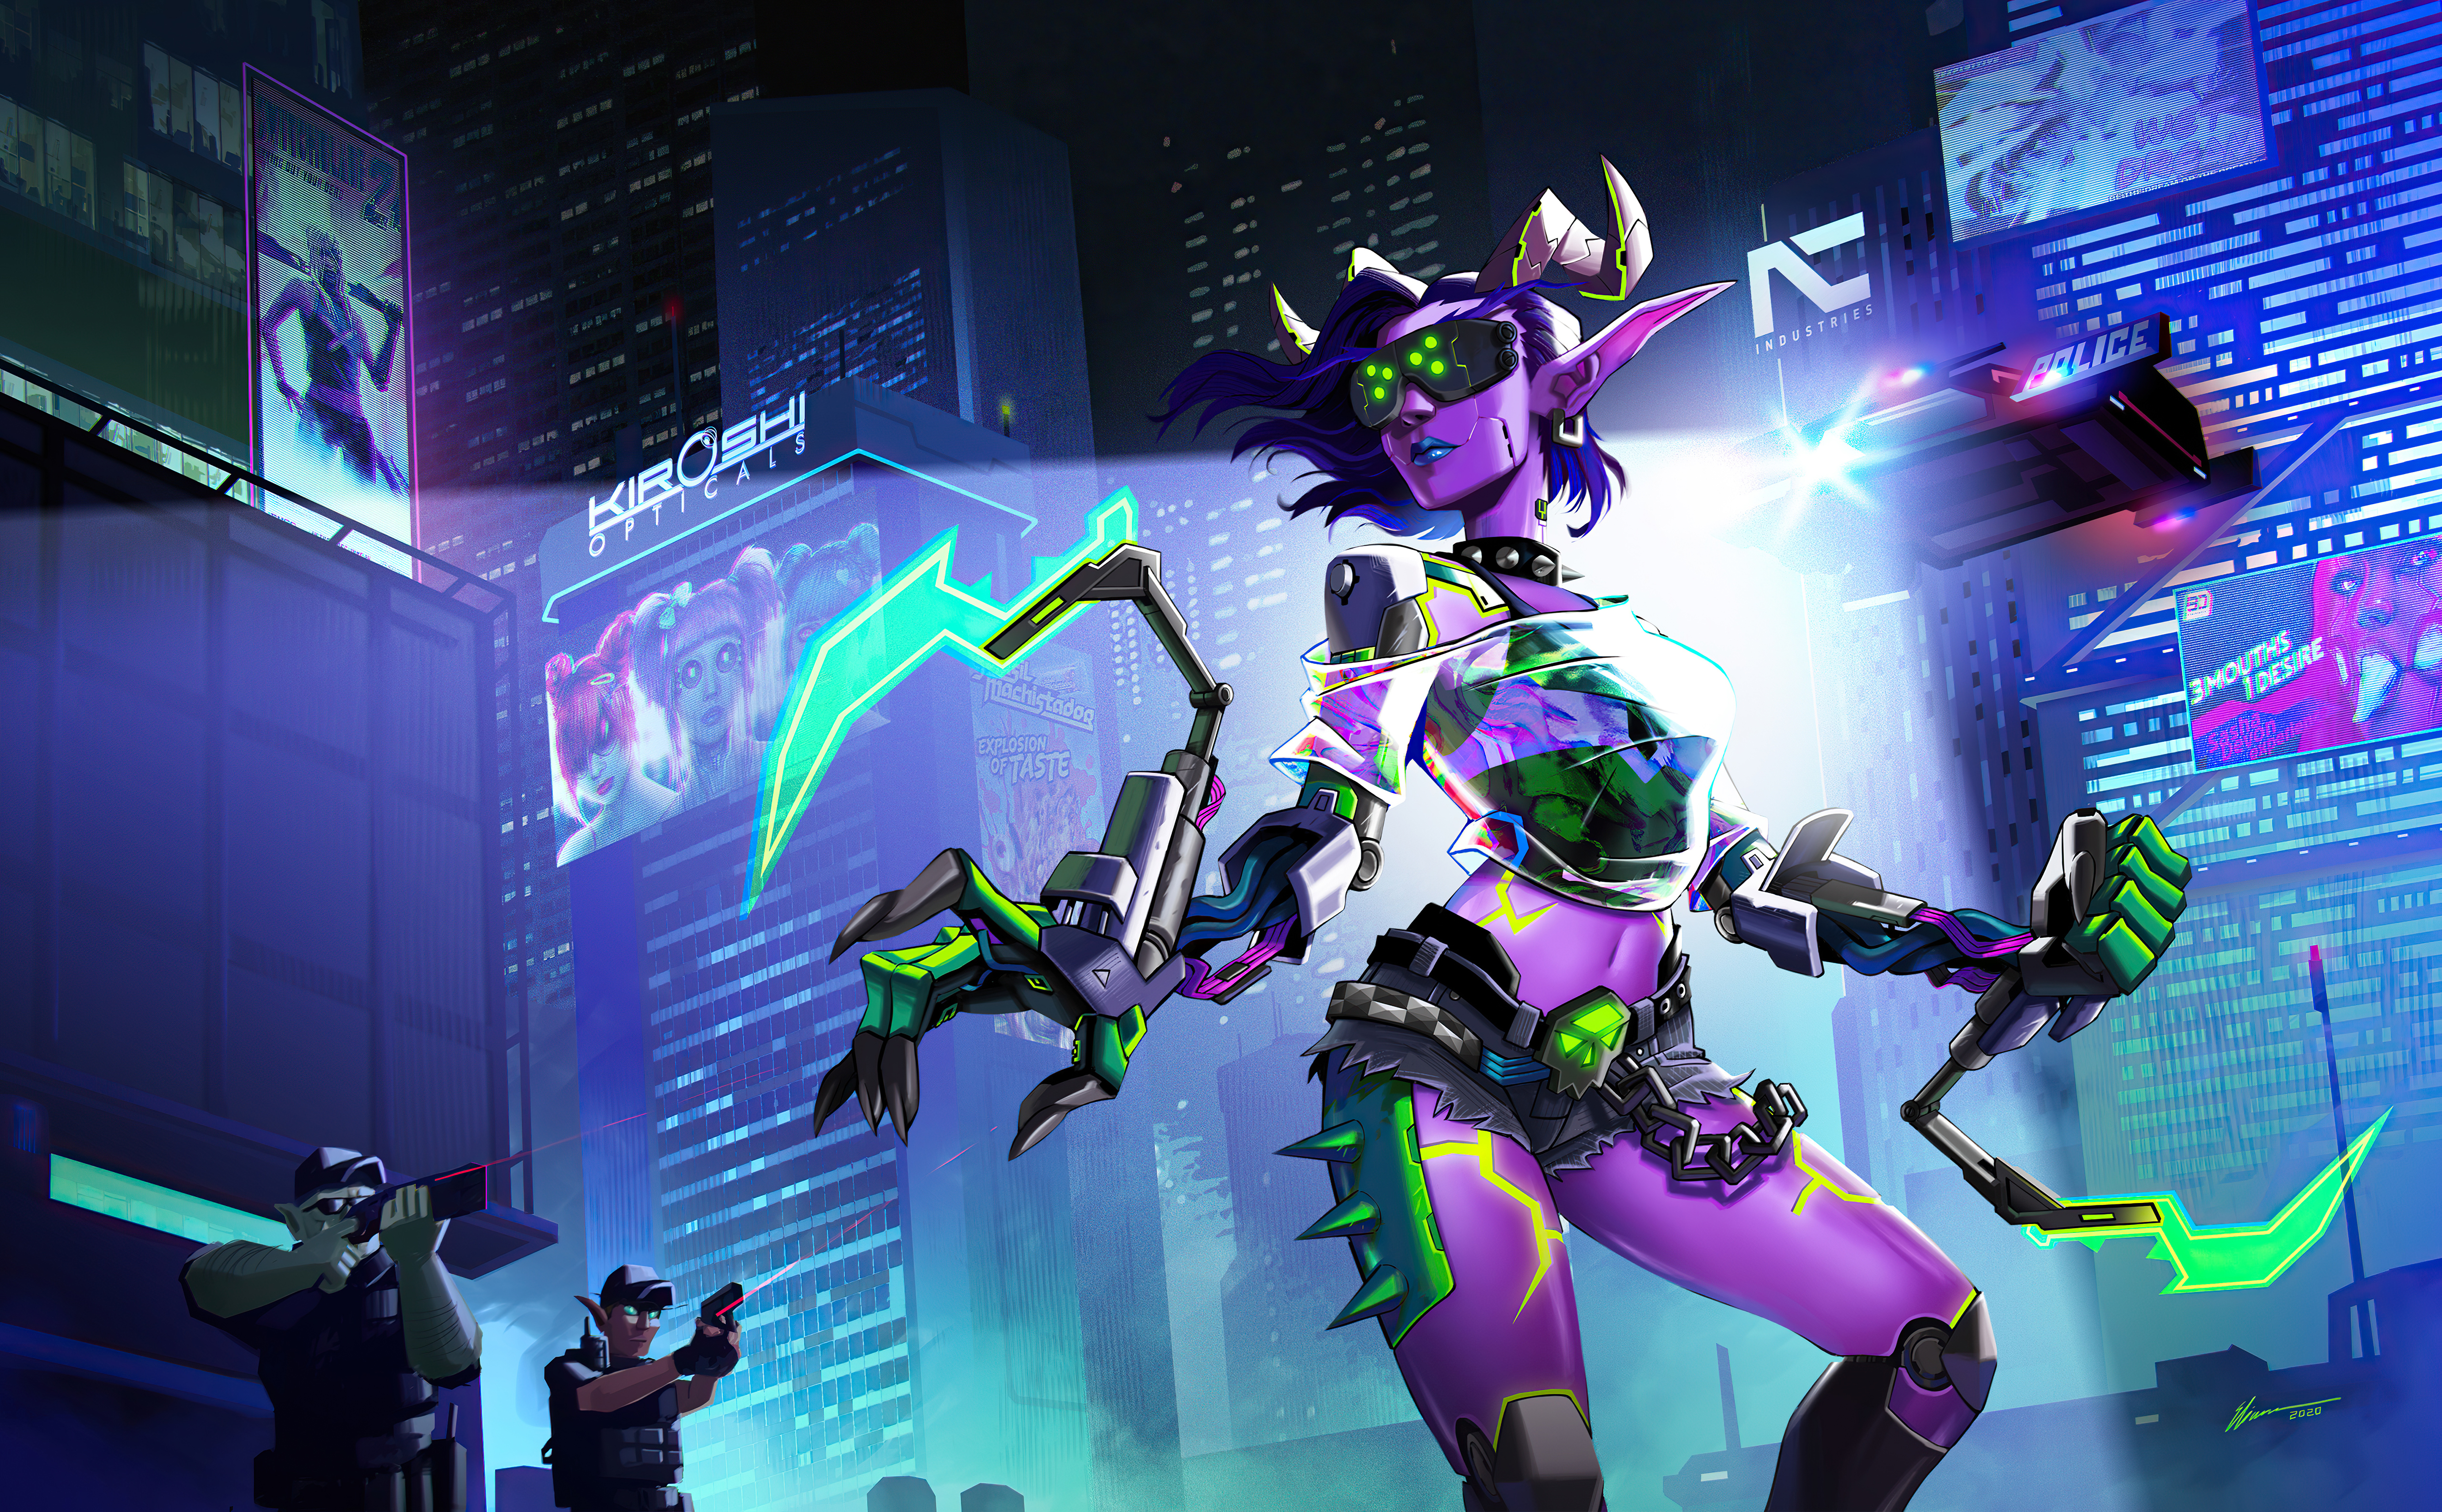 Fondos de pantalla World of Warcraft X Cyberpunk 2077